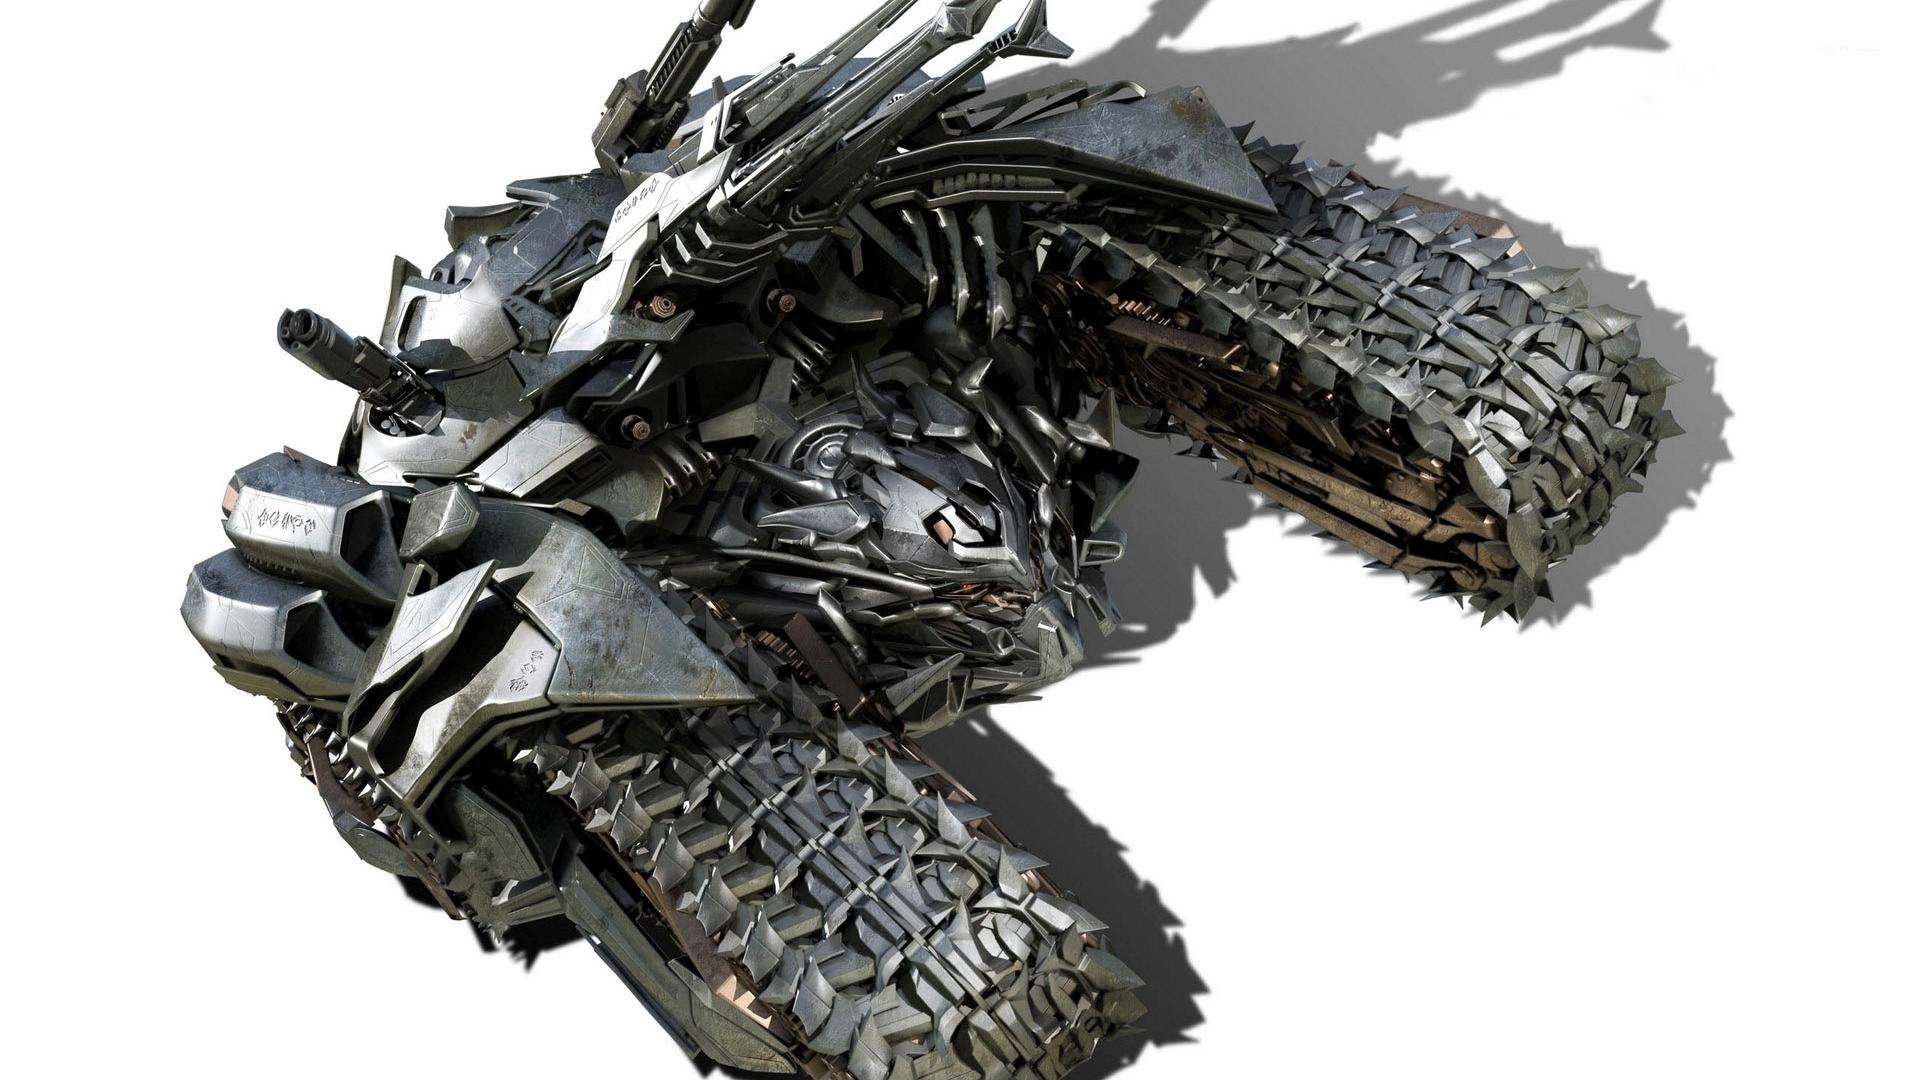 Transformers 5 Hd Wallpapers 1080p Download Megatron Transformers Wallpaper Movie Wallpapers 34560